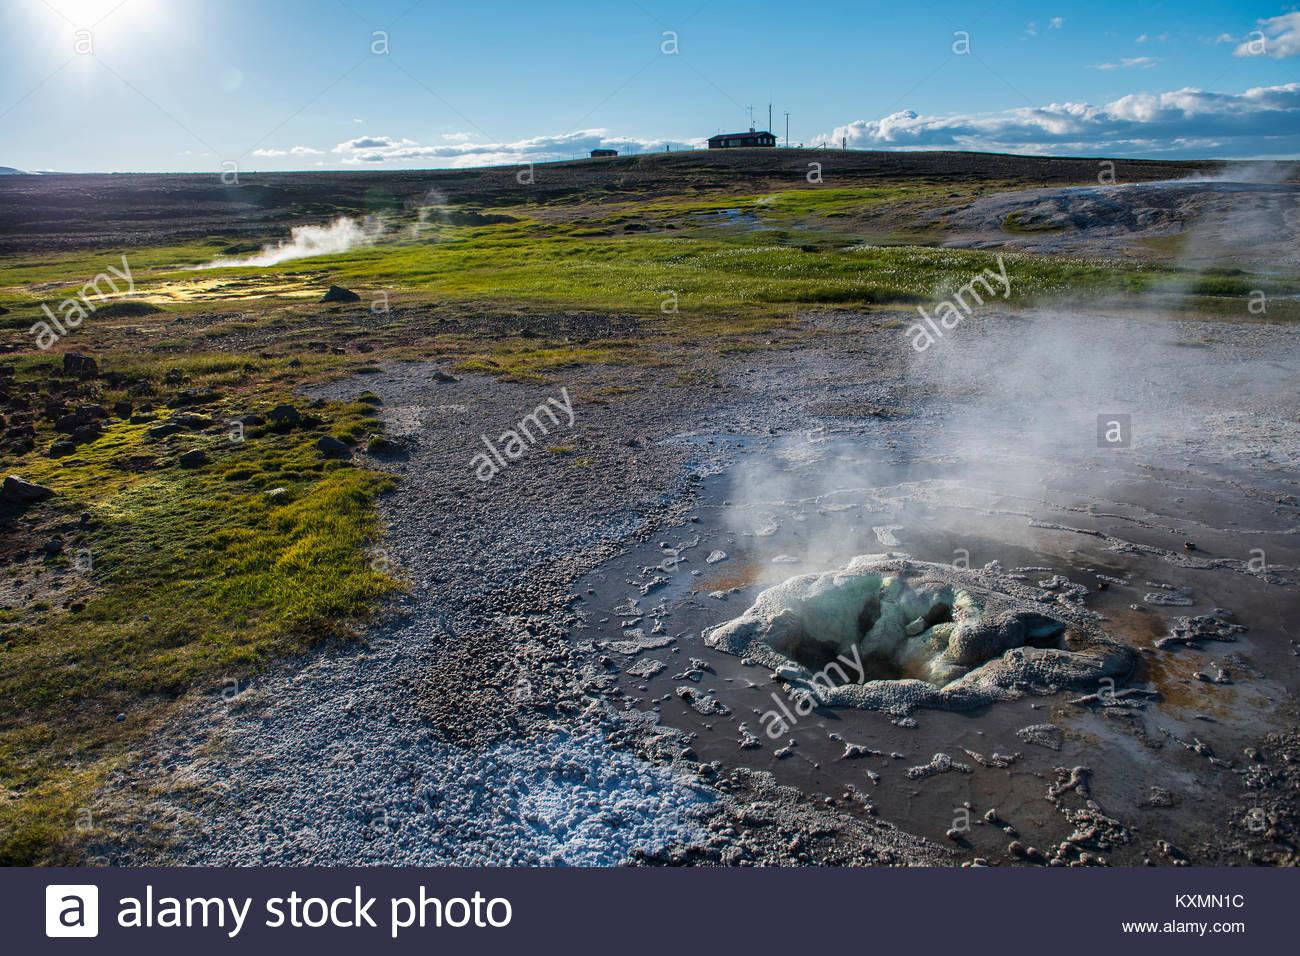 Geothermal hot springs,Hveravellir,Iceland - Stock Image